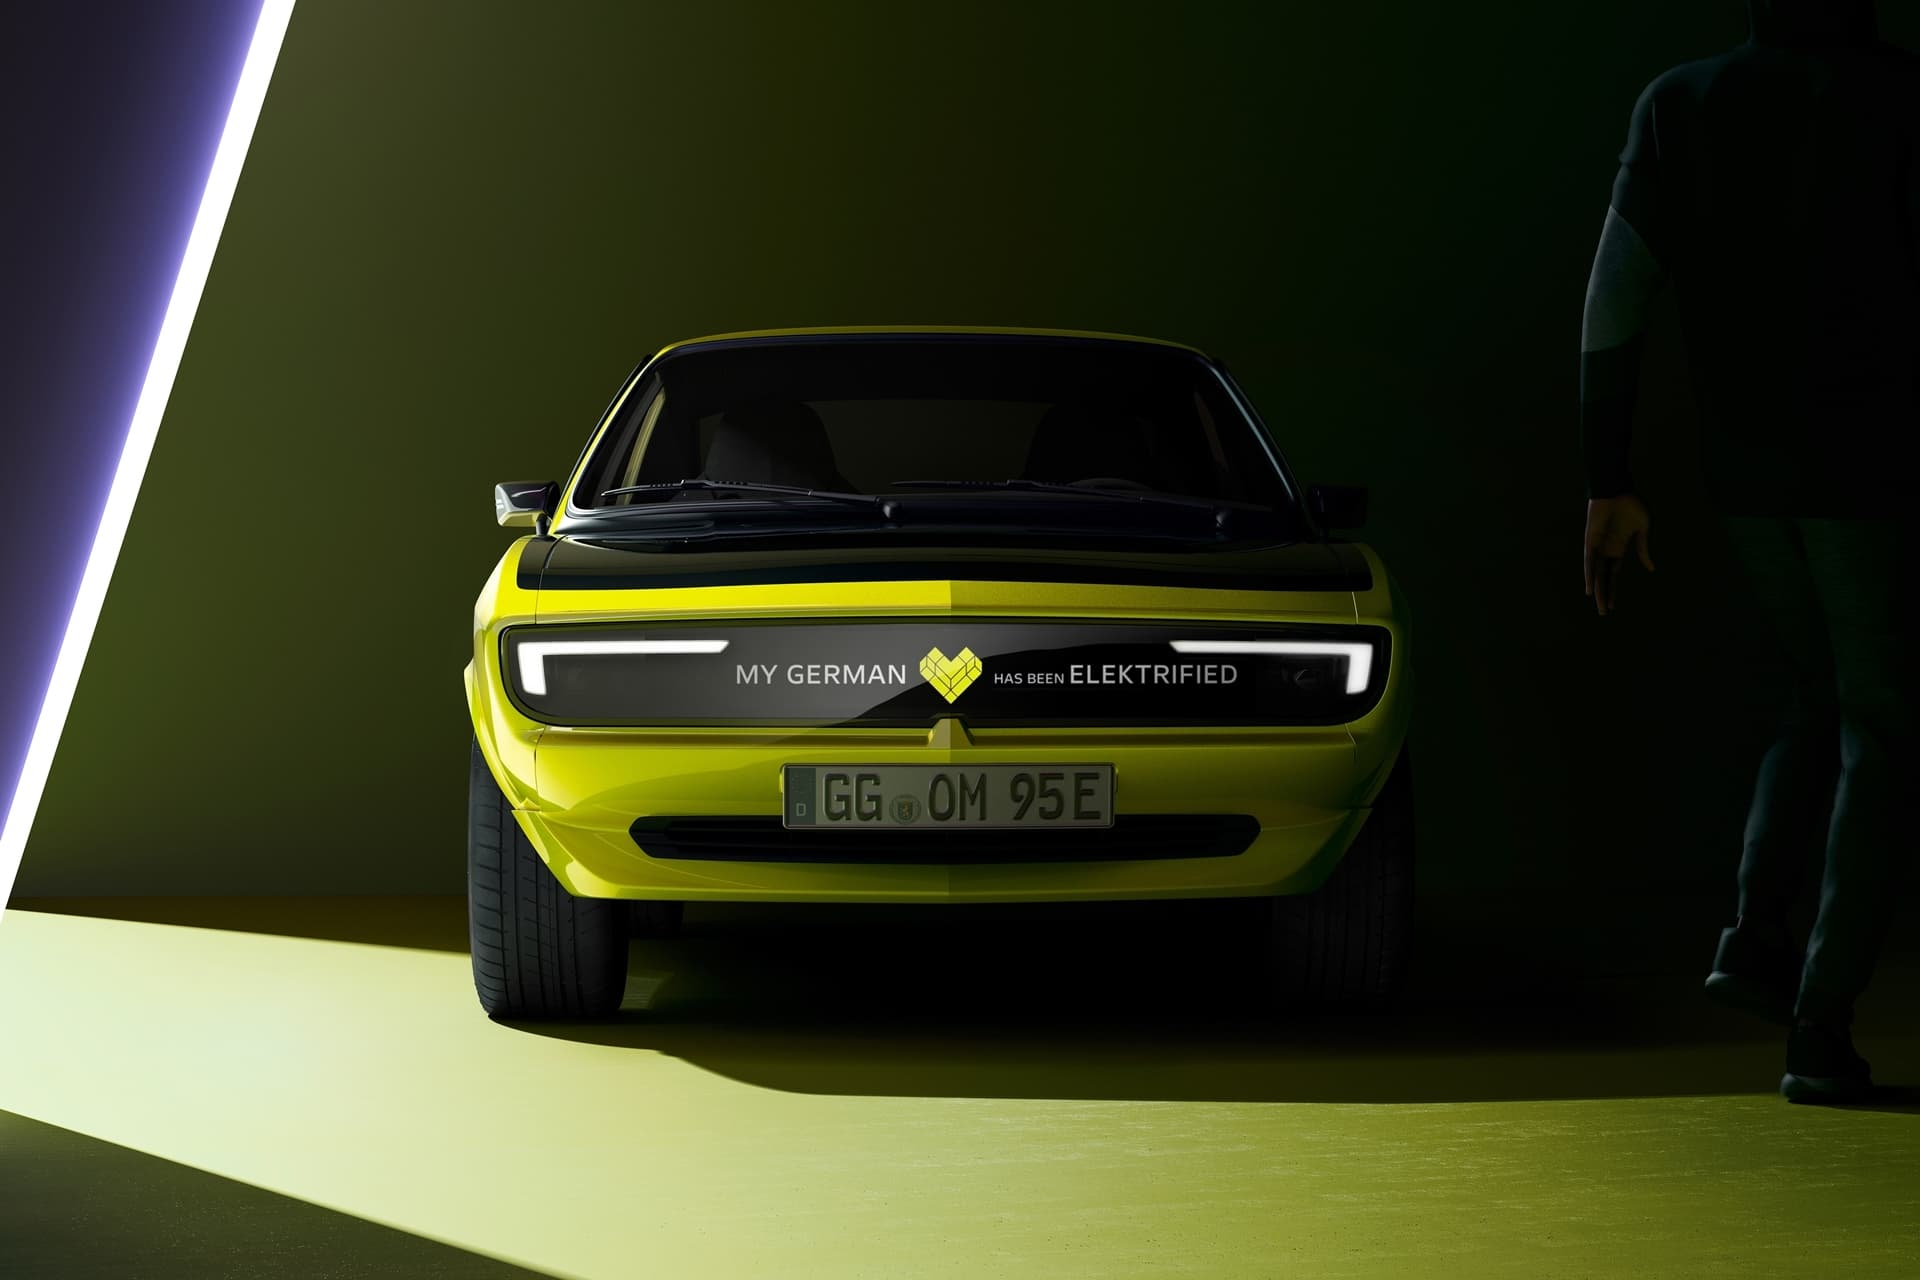 Opel Manta Gse 2021 0421 001